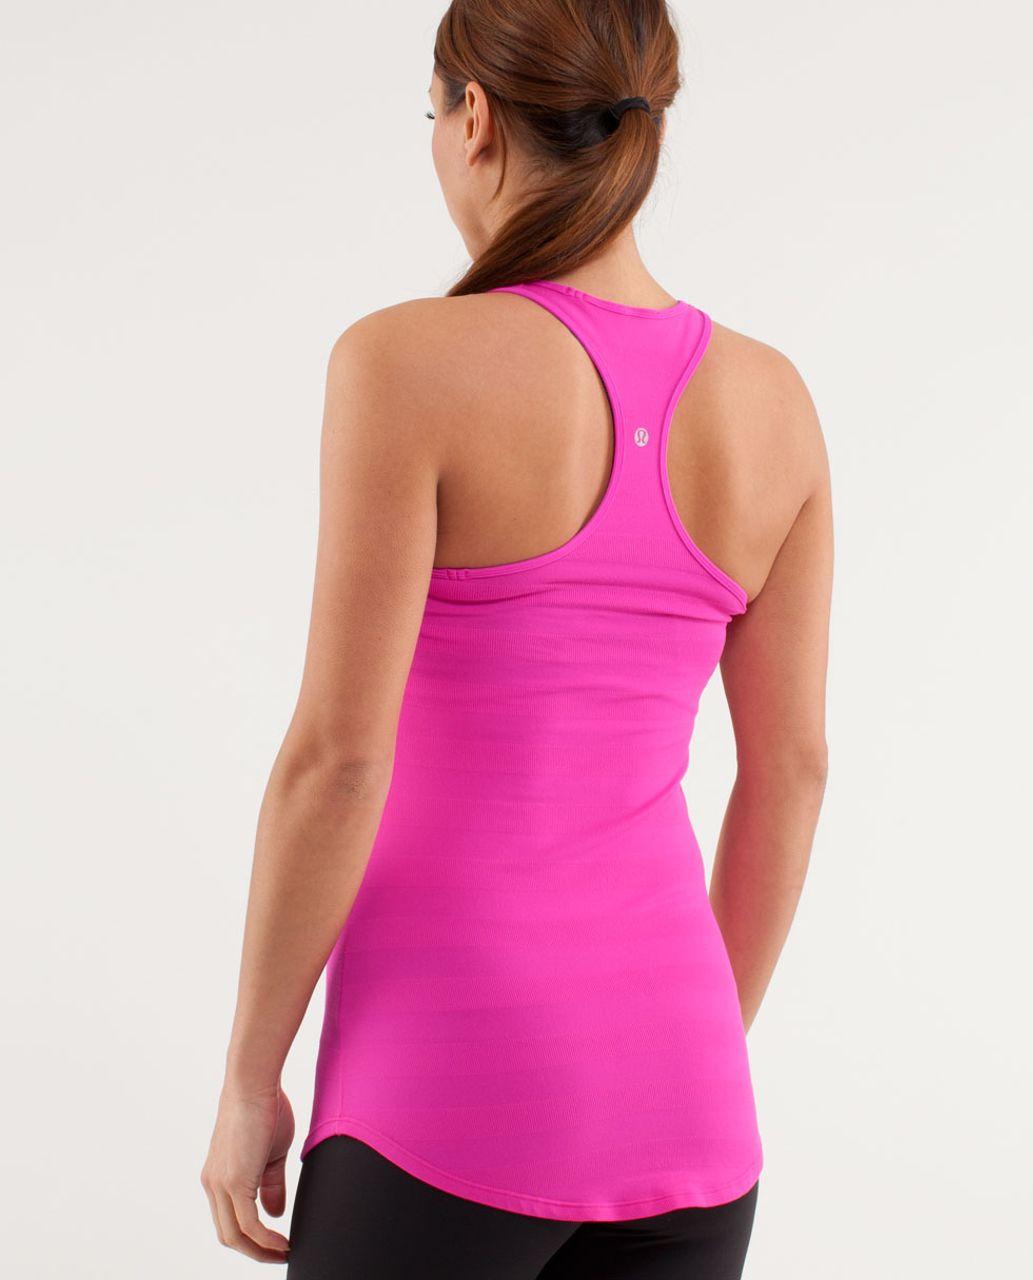 Lululemon Cool Racerback *Striped Rib - Paris Pink